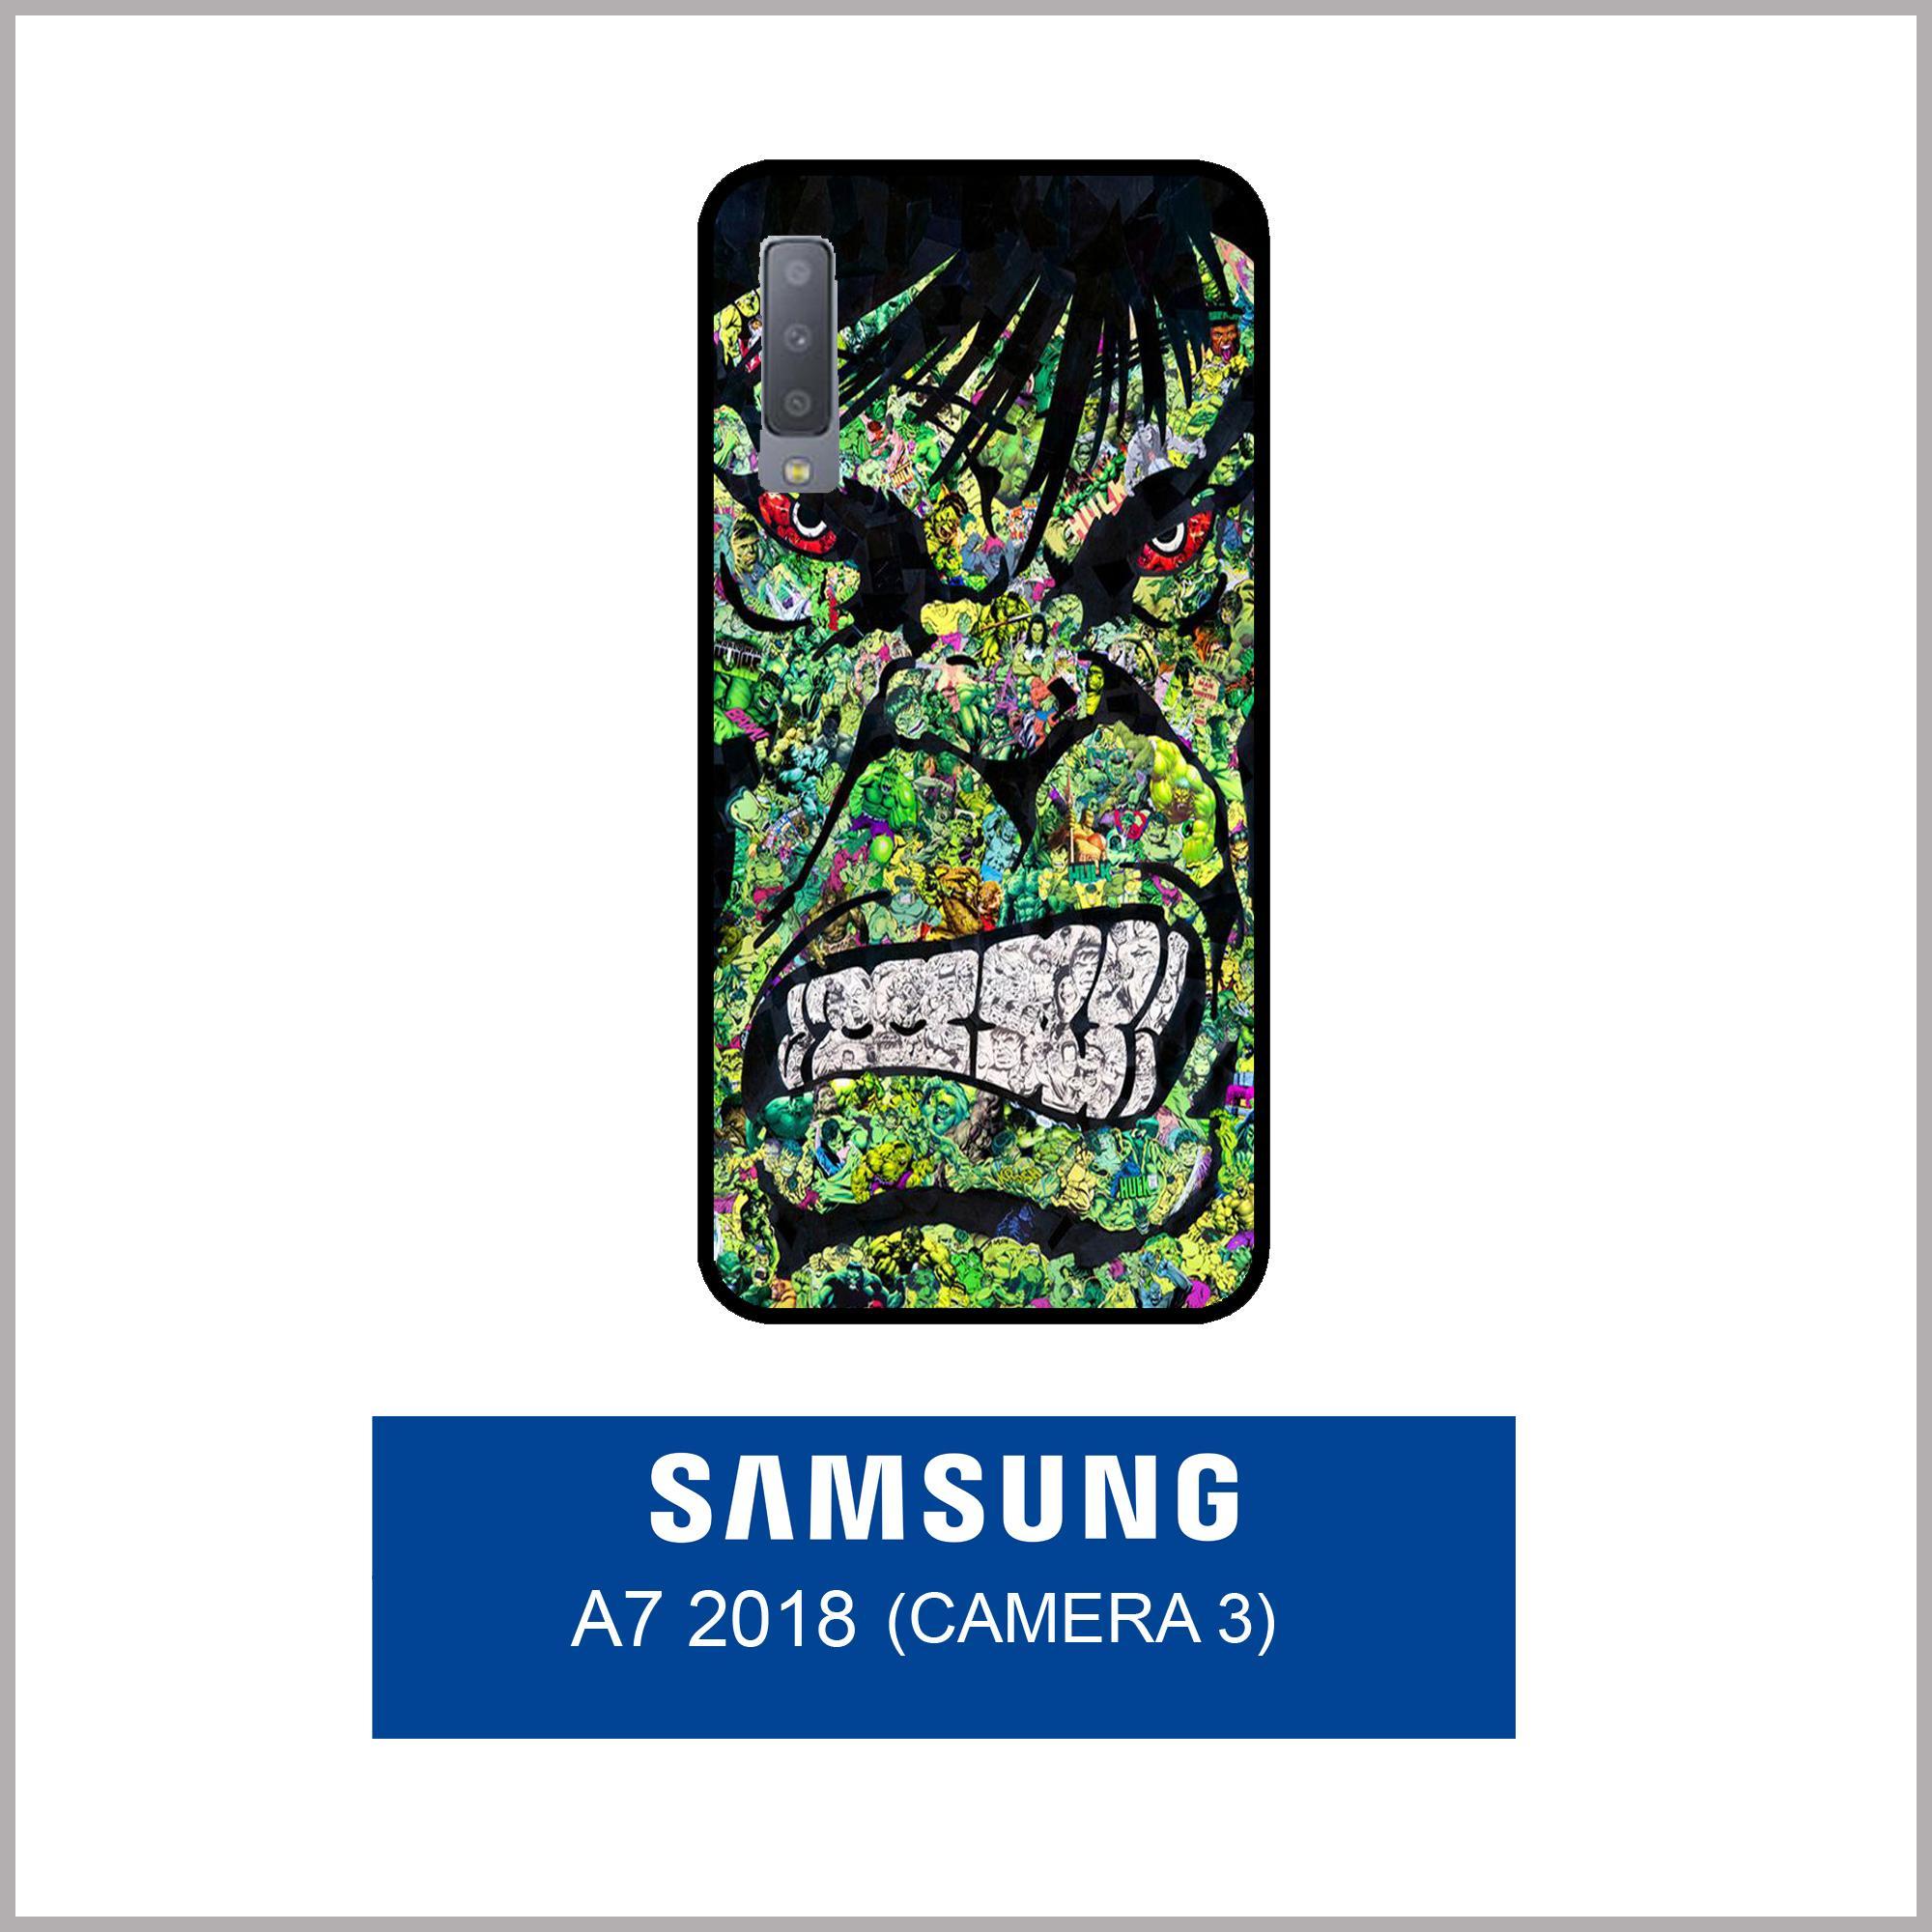 Rajamurah fasion printing case Samsung A7 2018 - 12 (camera 3)